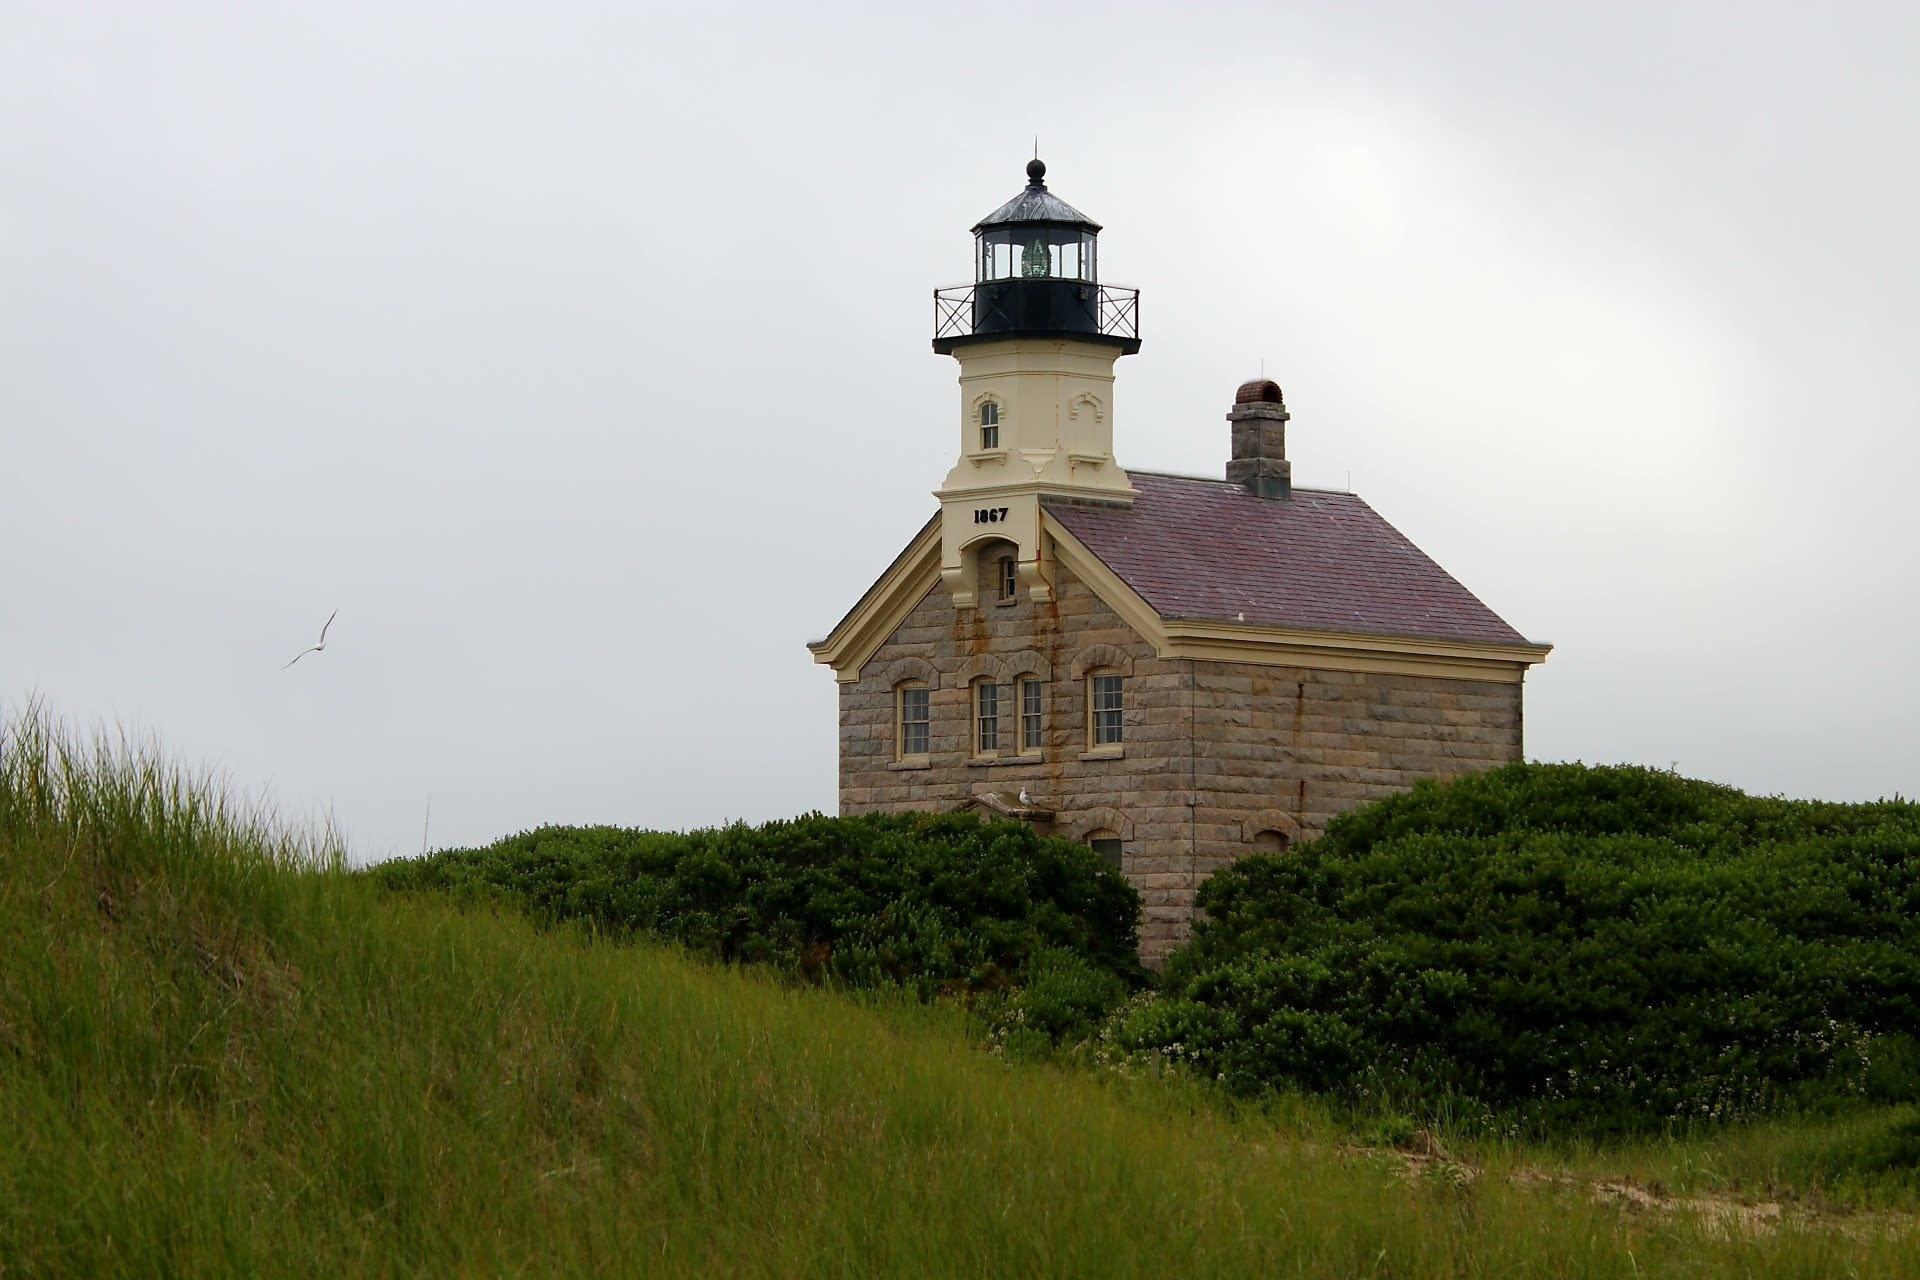 North Lighthouse, New Shoreham, Rhode Island, United States of America